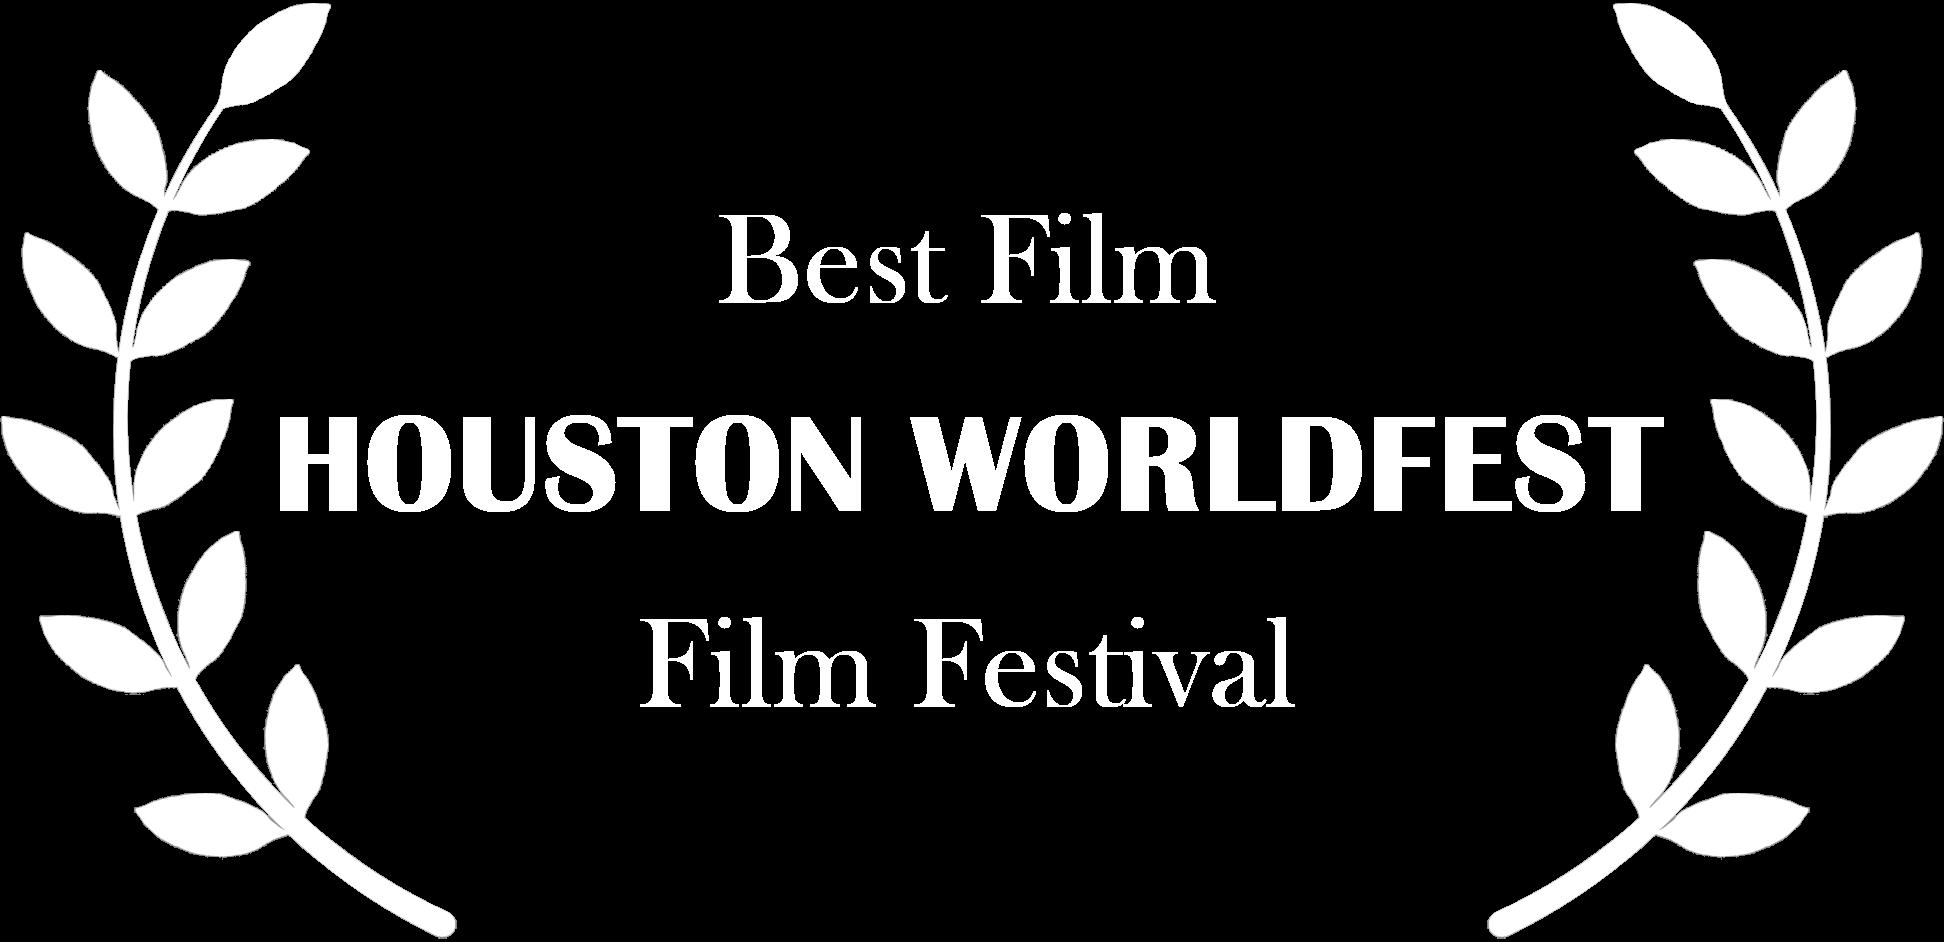 houston wordfest